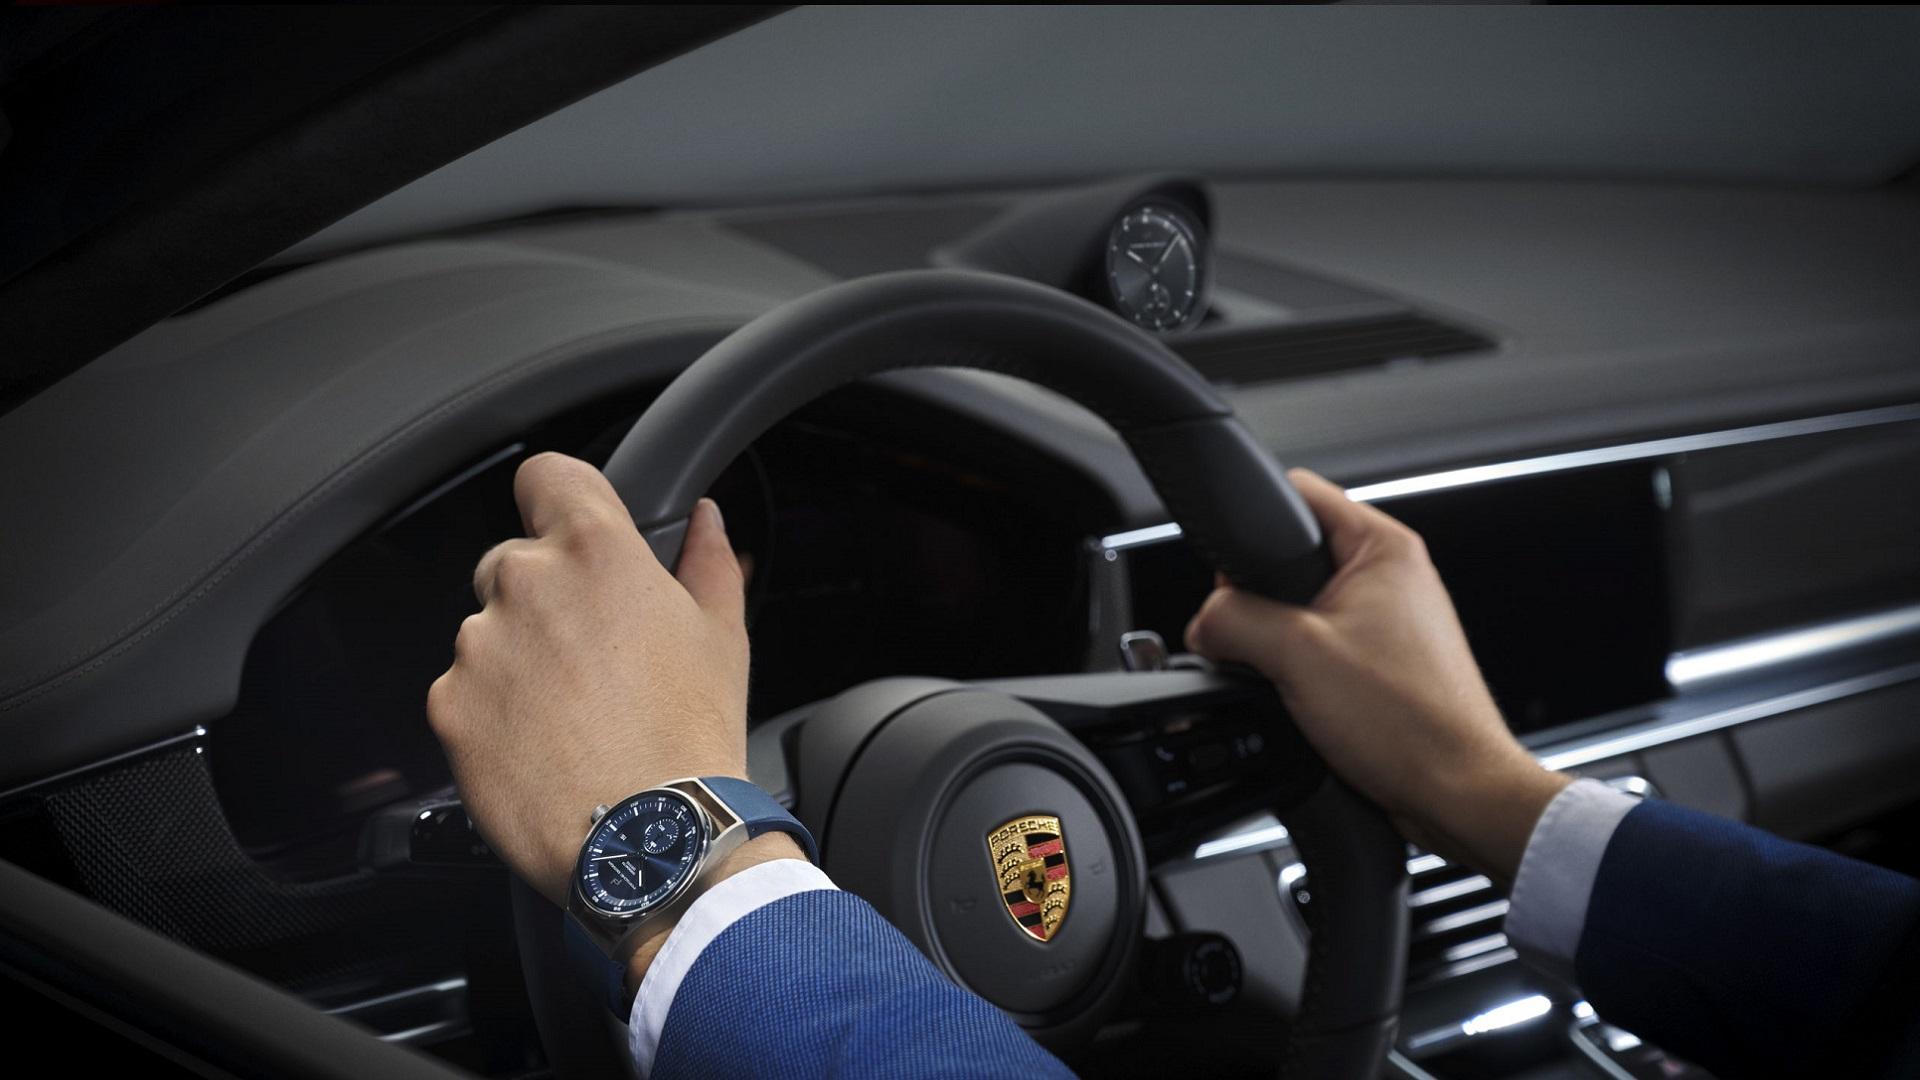 Reloj Sport Chrono Porsche Design, en tu coche y en tu muñeca